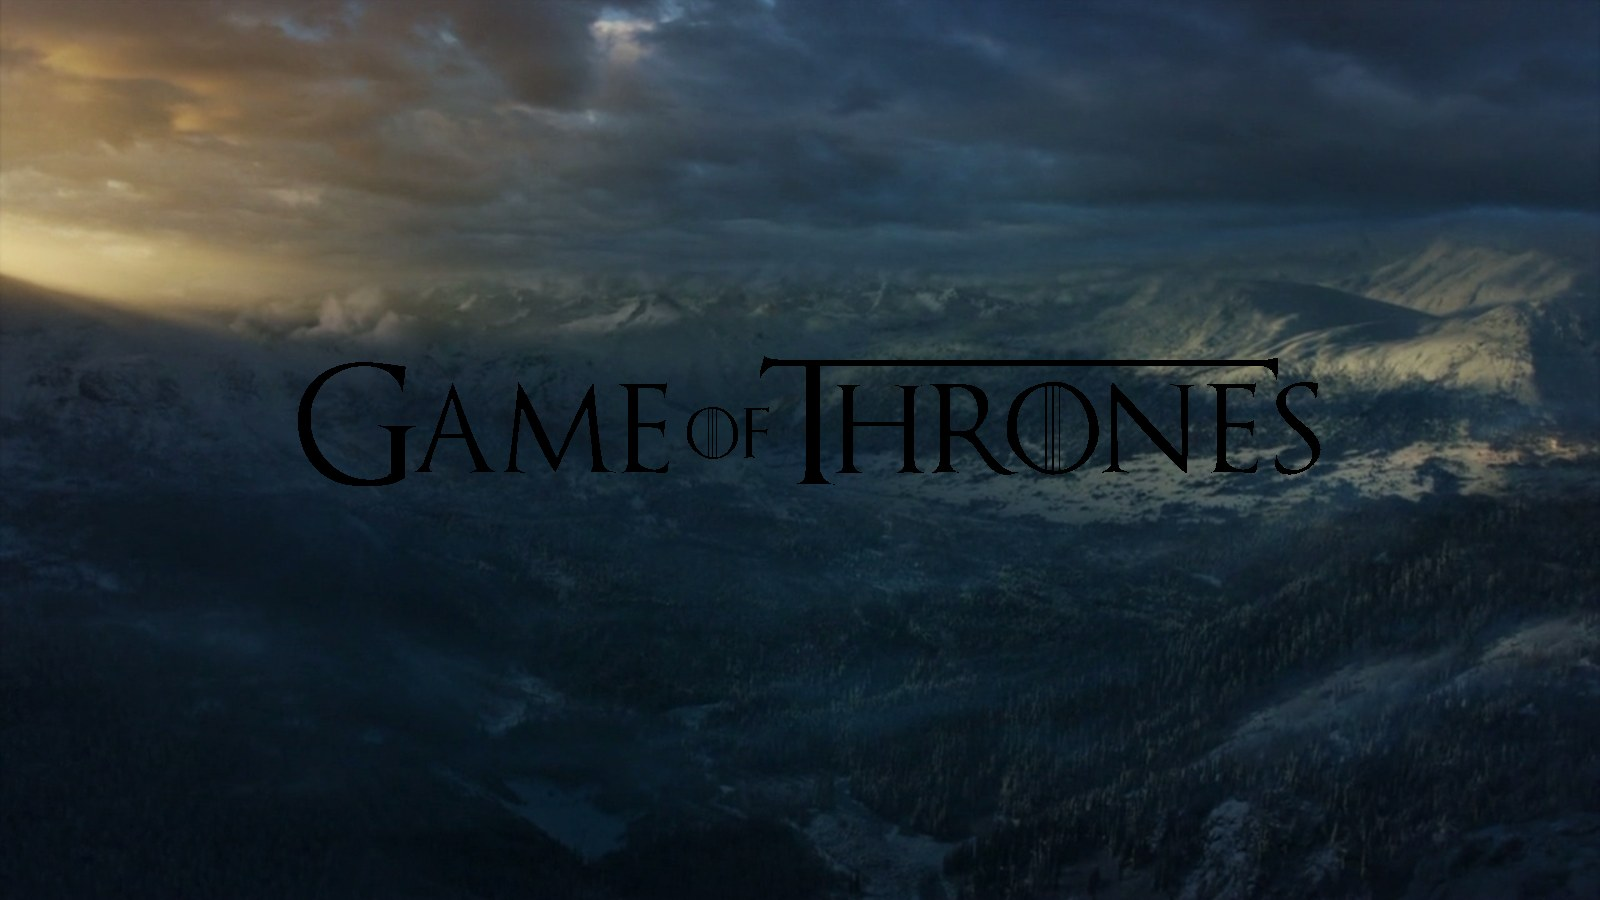 Game Of Thrones Background Wallpaper wallpapers55com   Best 1600x900